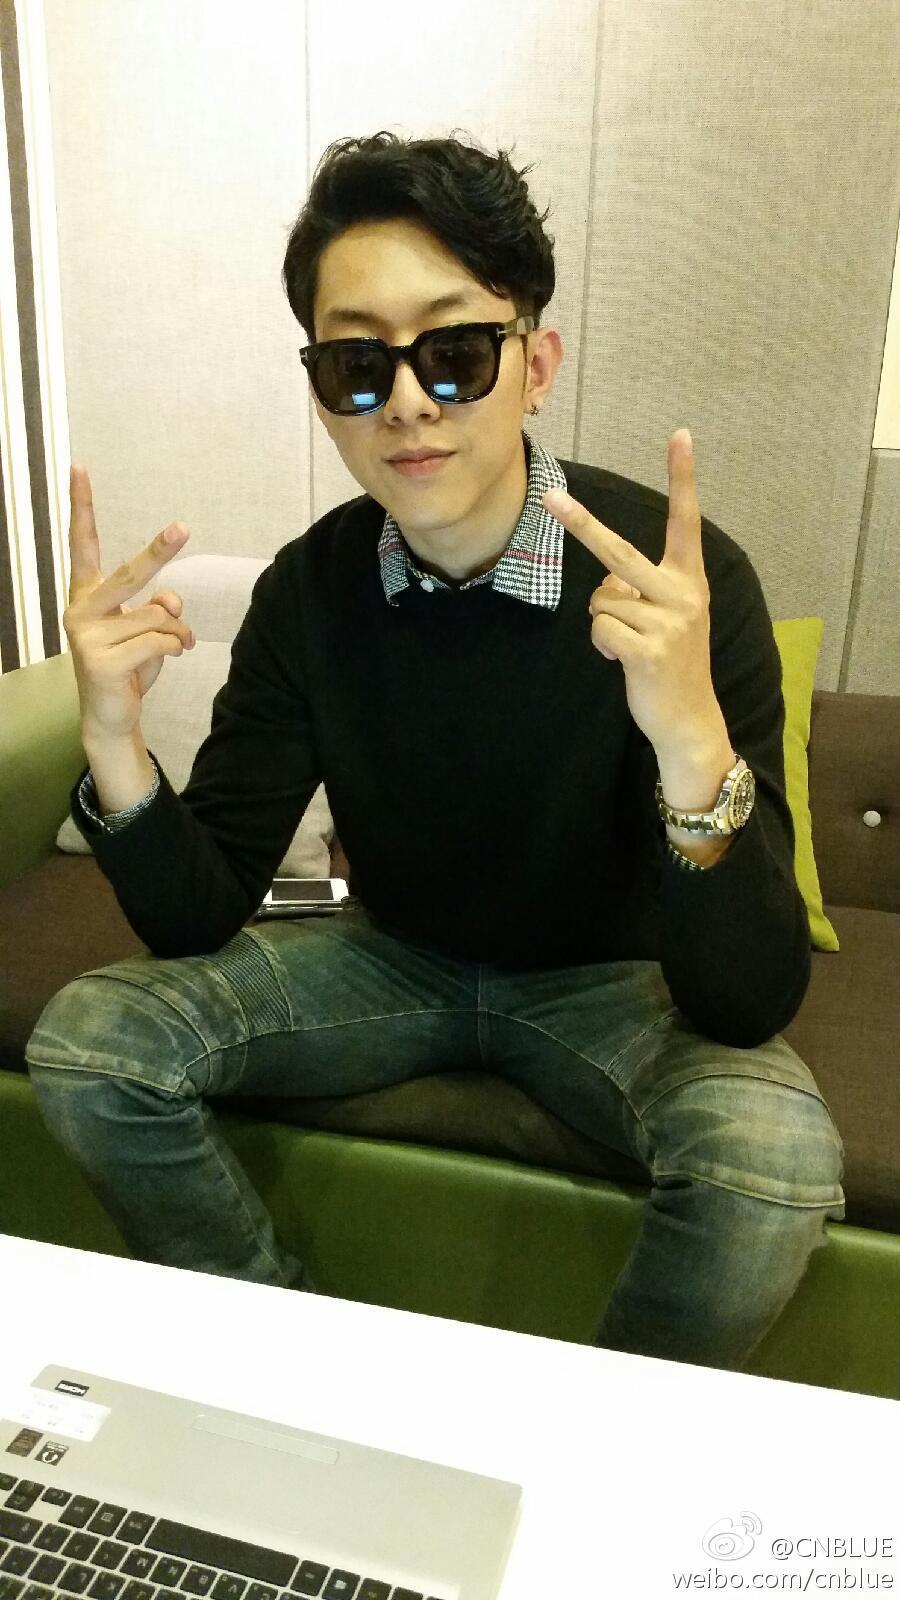 CN Blue - Lee Jungshin Weibo�da Hayranlar� �le Sohbet Etti /// 13.10.2014